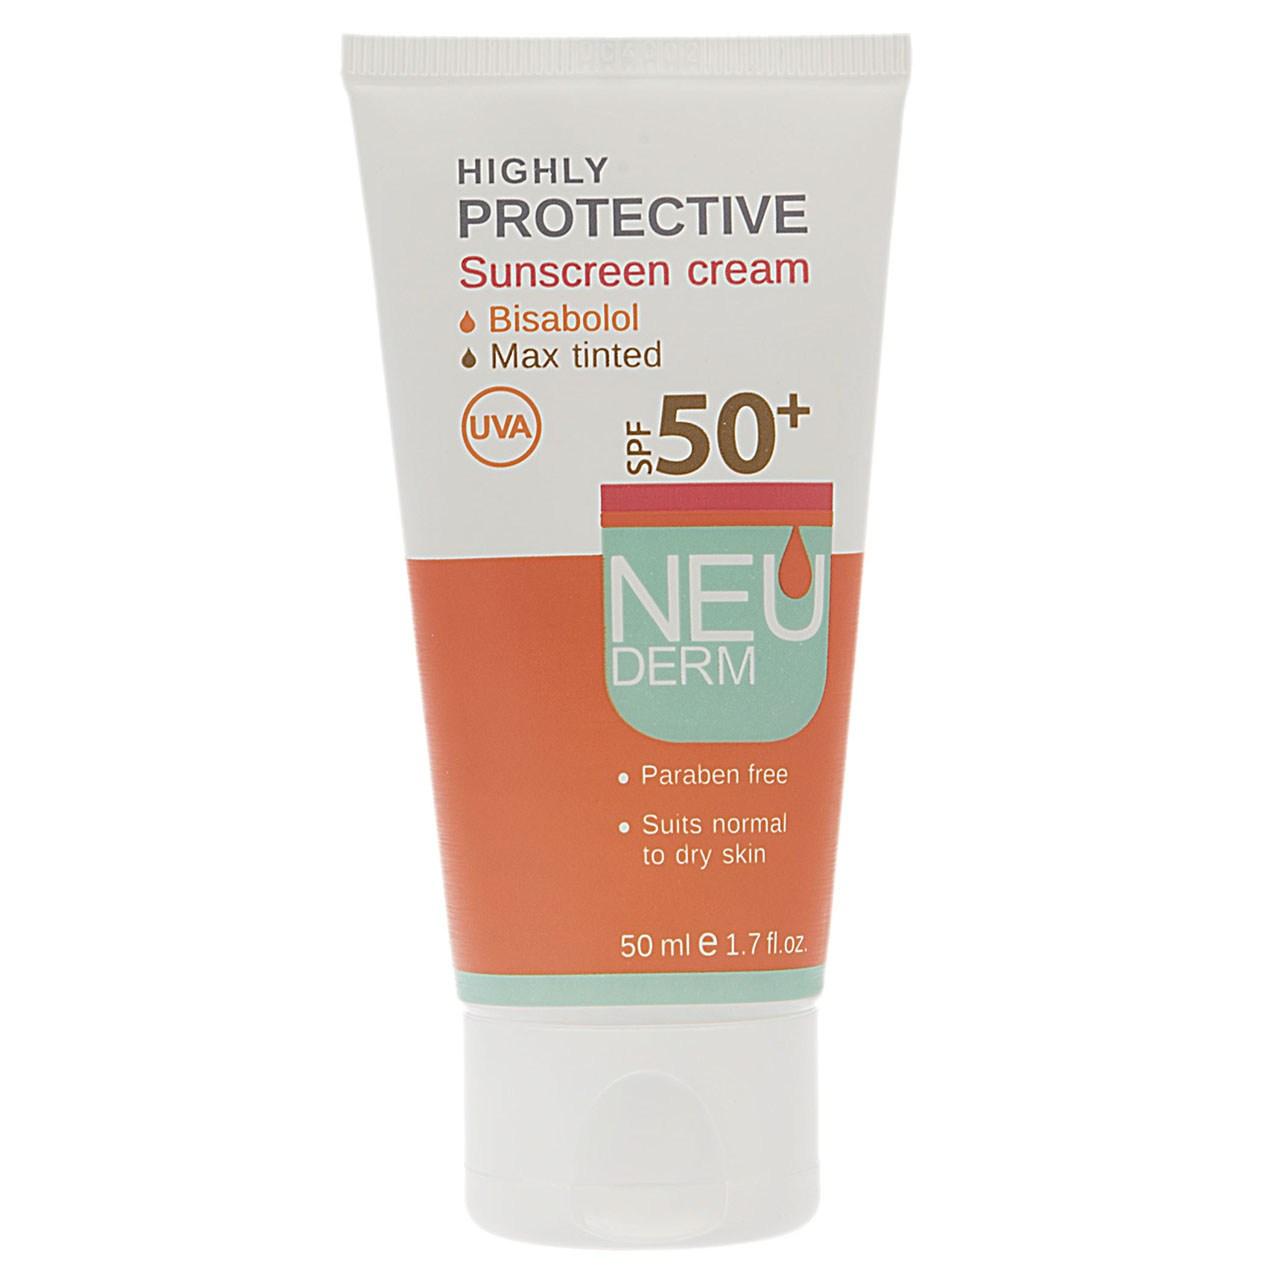 قیمت کرم ضد آفتاب رنگی نئودرم مدل Highly Protective SPF50 حجم 50 میلی لیتر